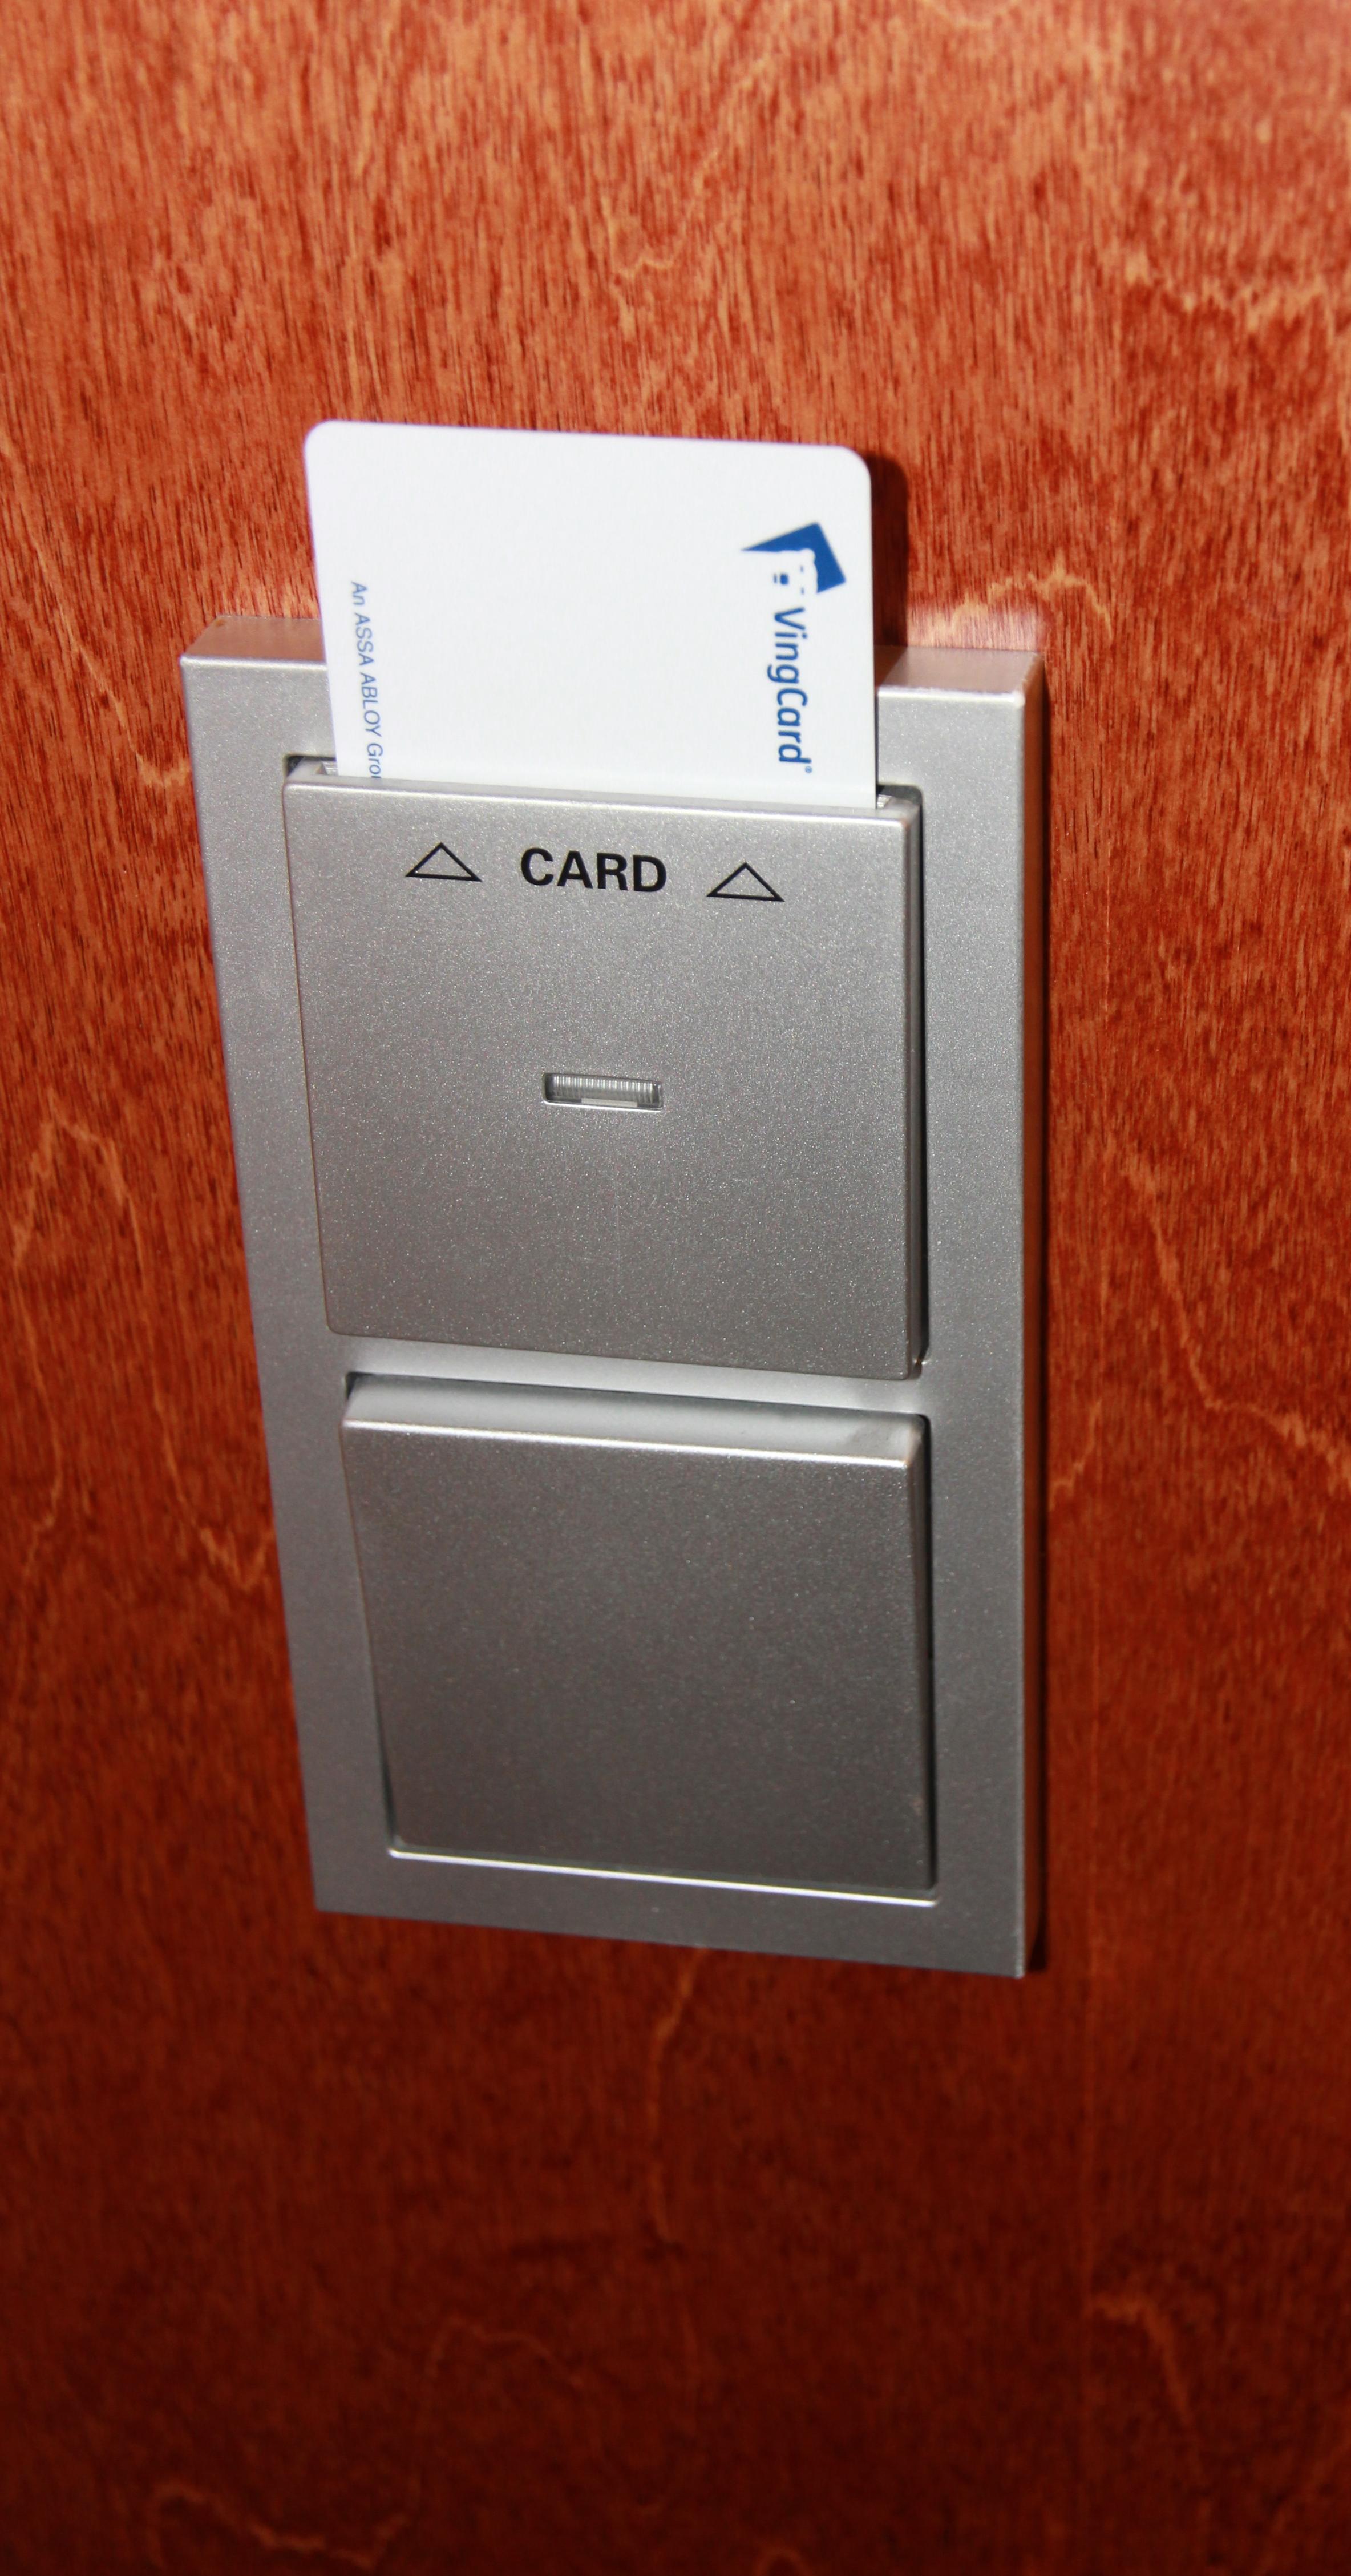 File:Hotel key card holder.JPG - Wikimedia Commons